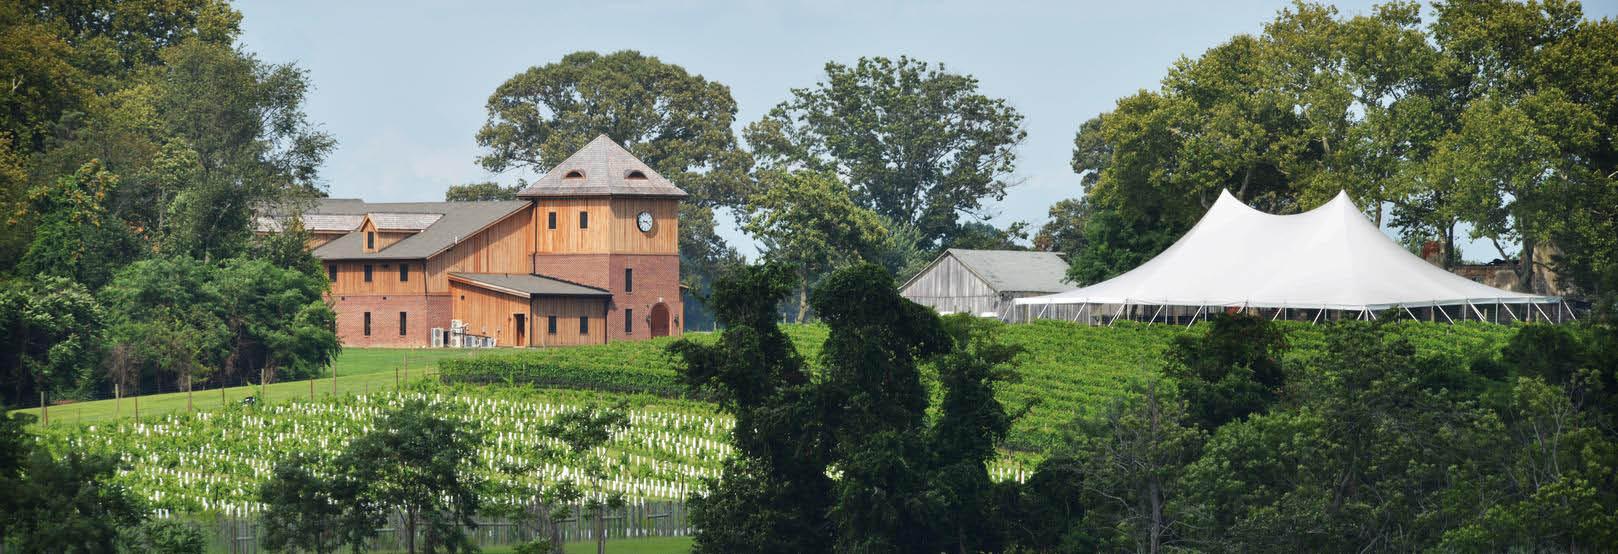 Chateau Bu De Winery, winery, wine, wine valpak, wine discount, winery tour, events, wedding